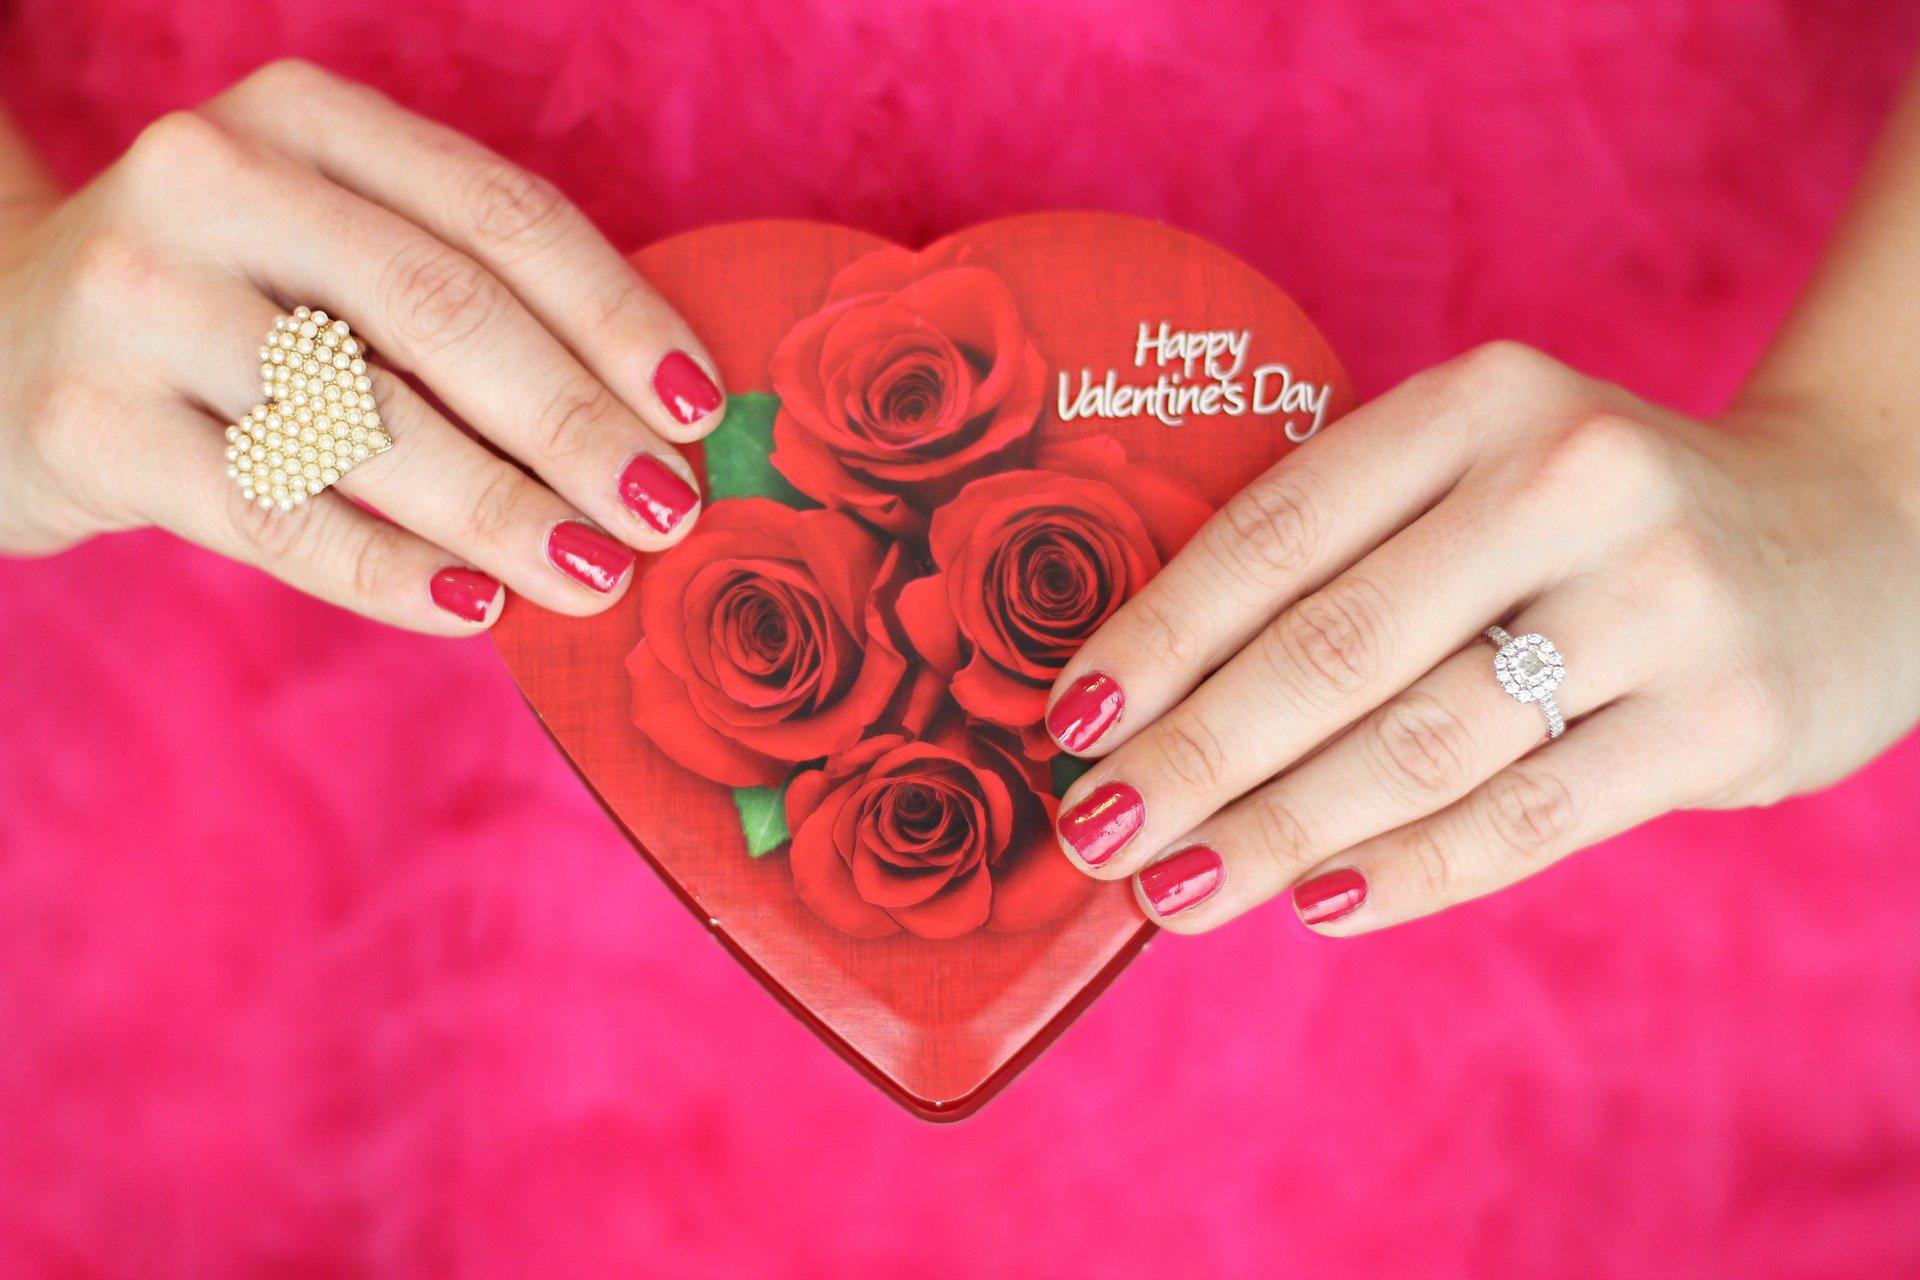 https://cdn.entertainmentdaily.com/2020/02/13104733/valentines-day-2042048_1920.jpg